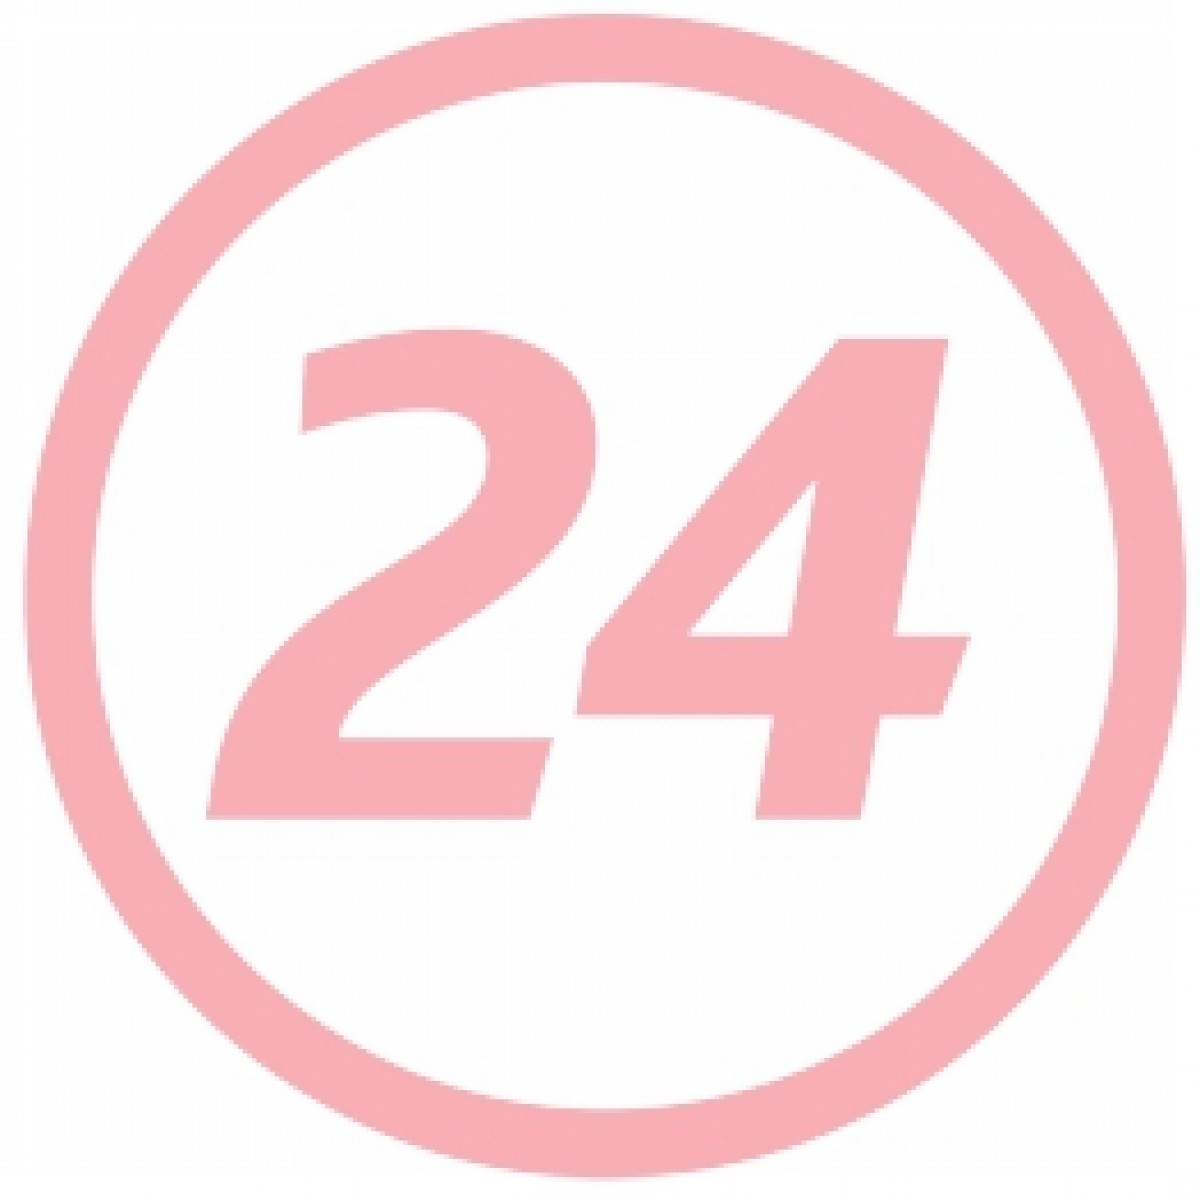 AVENE Cleanance DUO Gel Curatare, 70% Reducere la al Doilea Produs, 2x 200ml